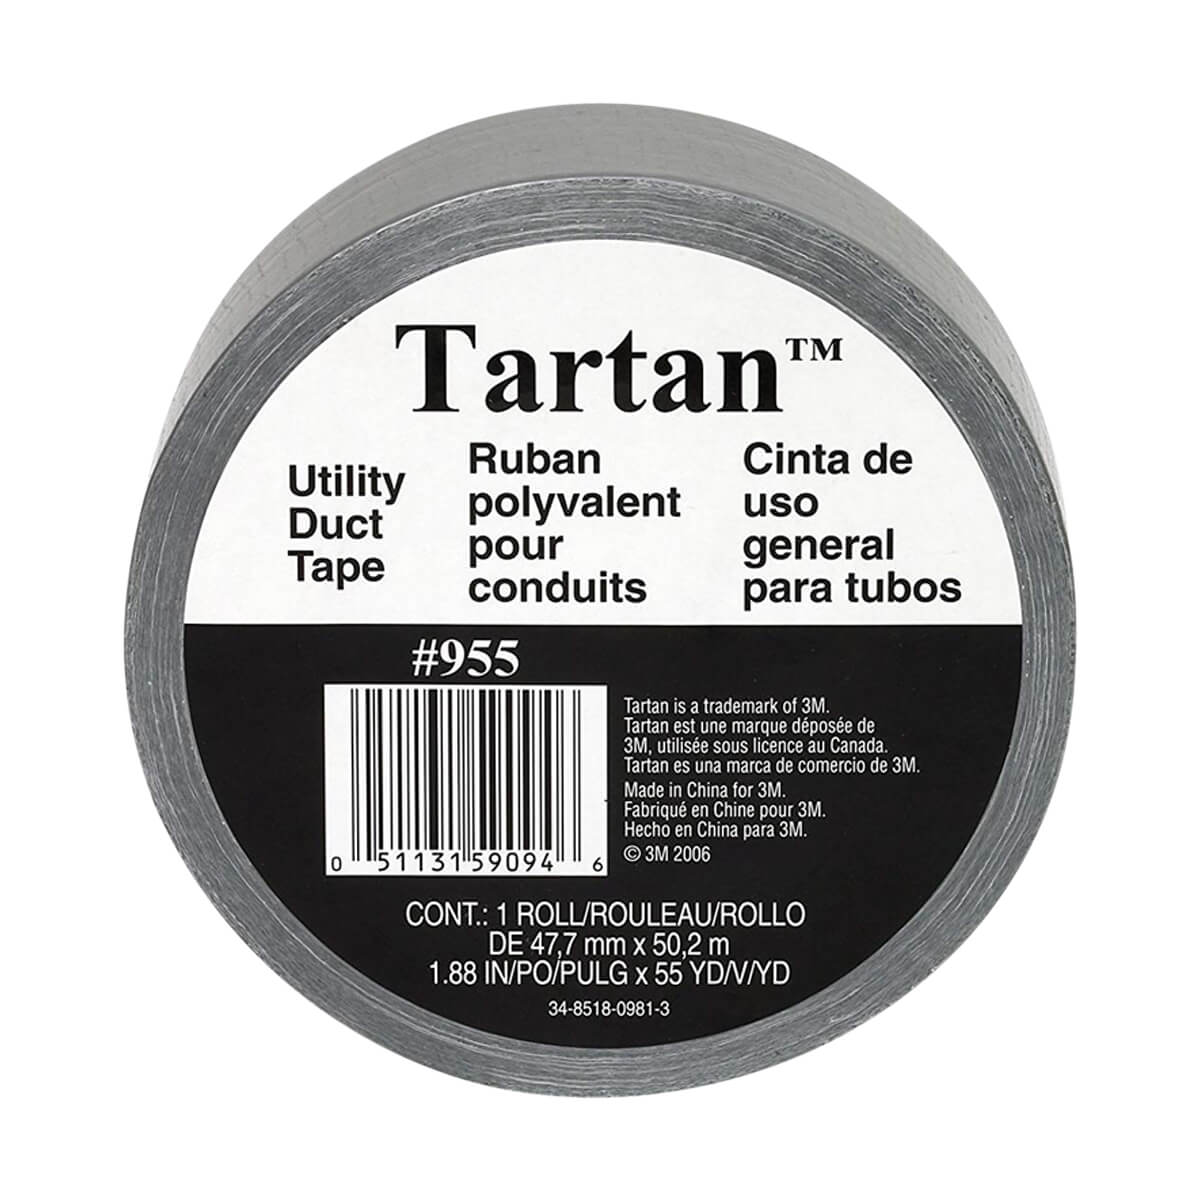 3M Tartan Utility Duct Tape